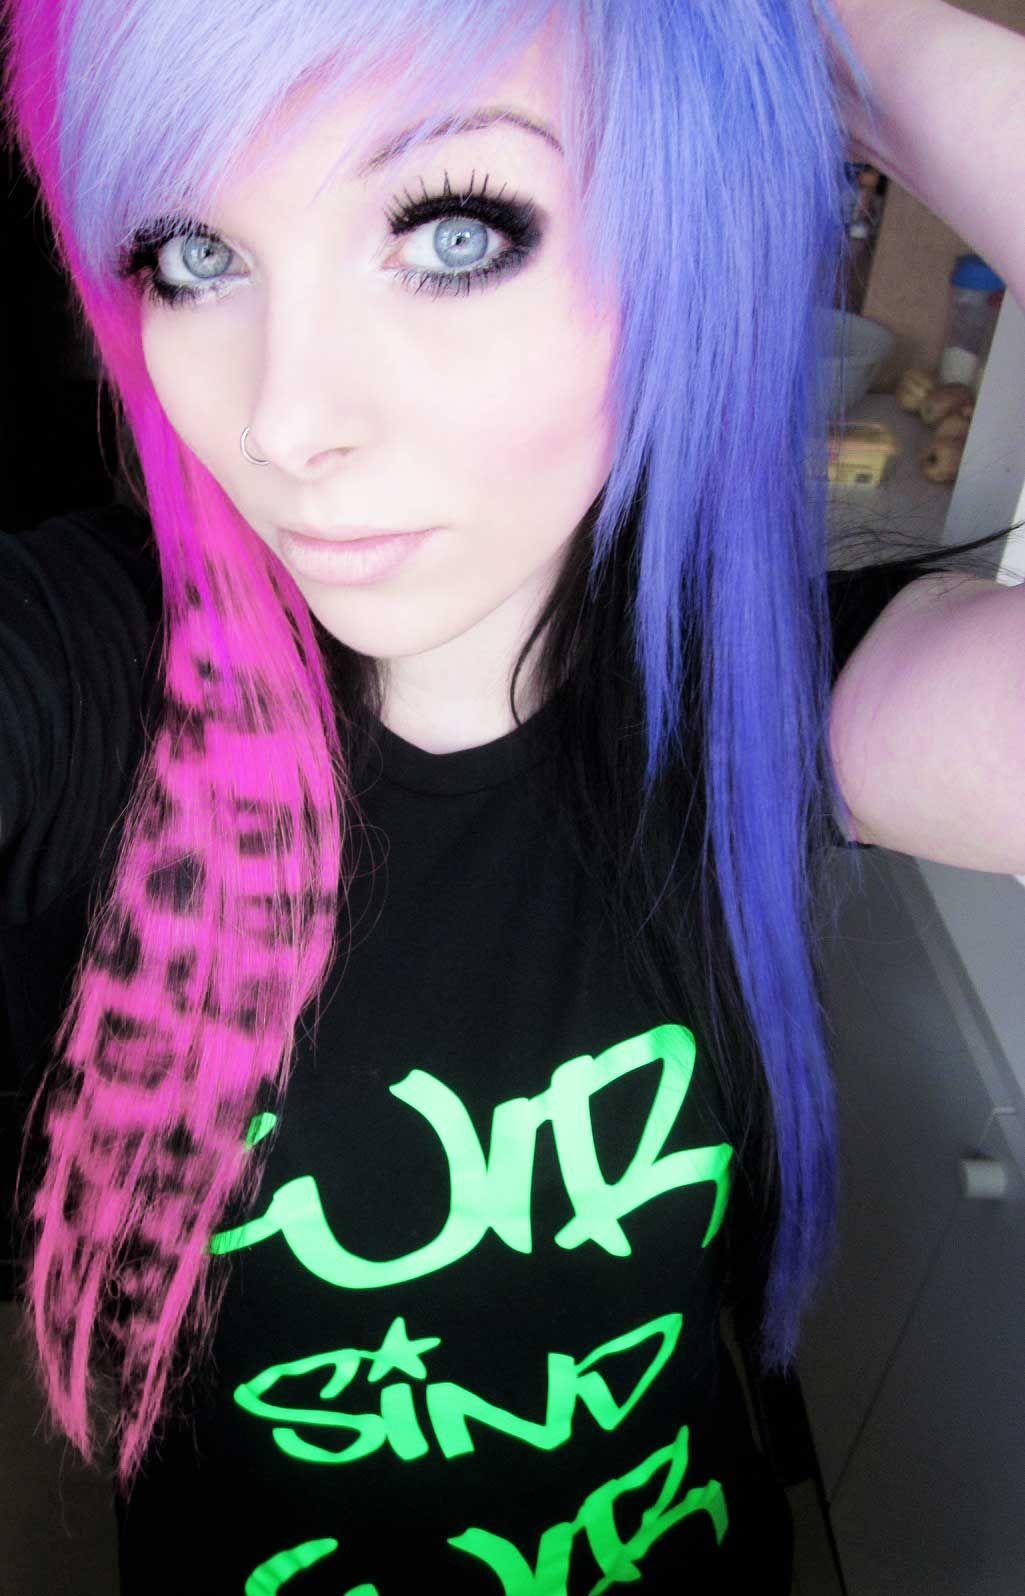 Emo girl ira vampira scene queen colorful hair purple blue pink